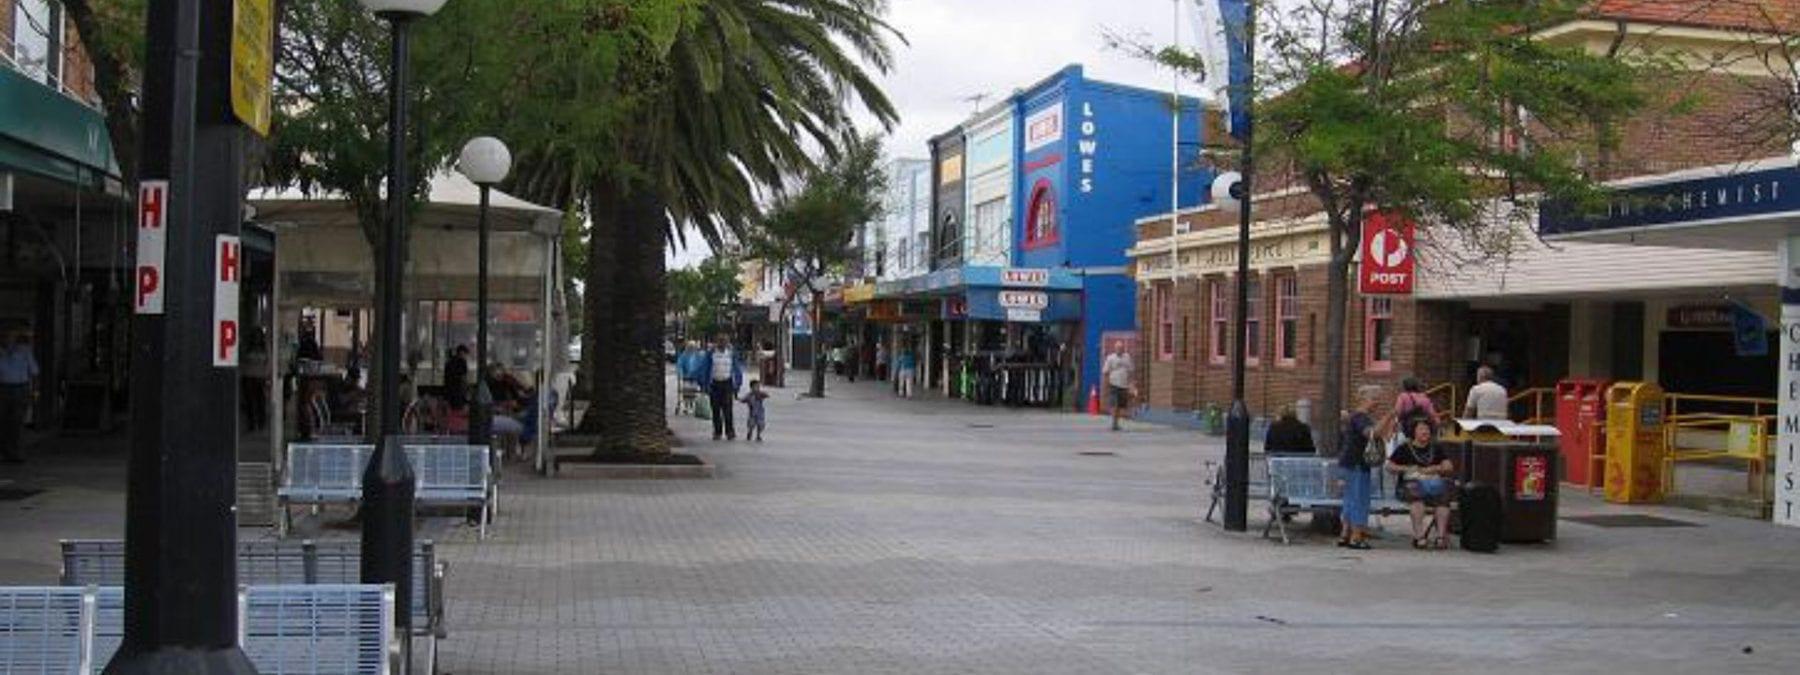 Caringbah street view